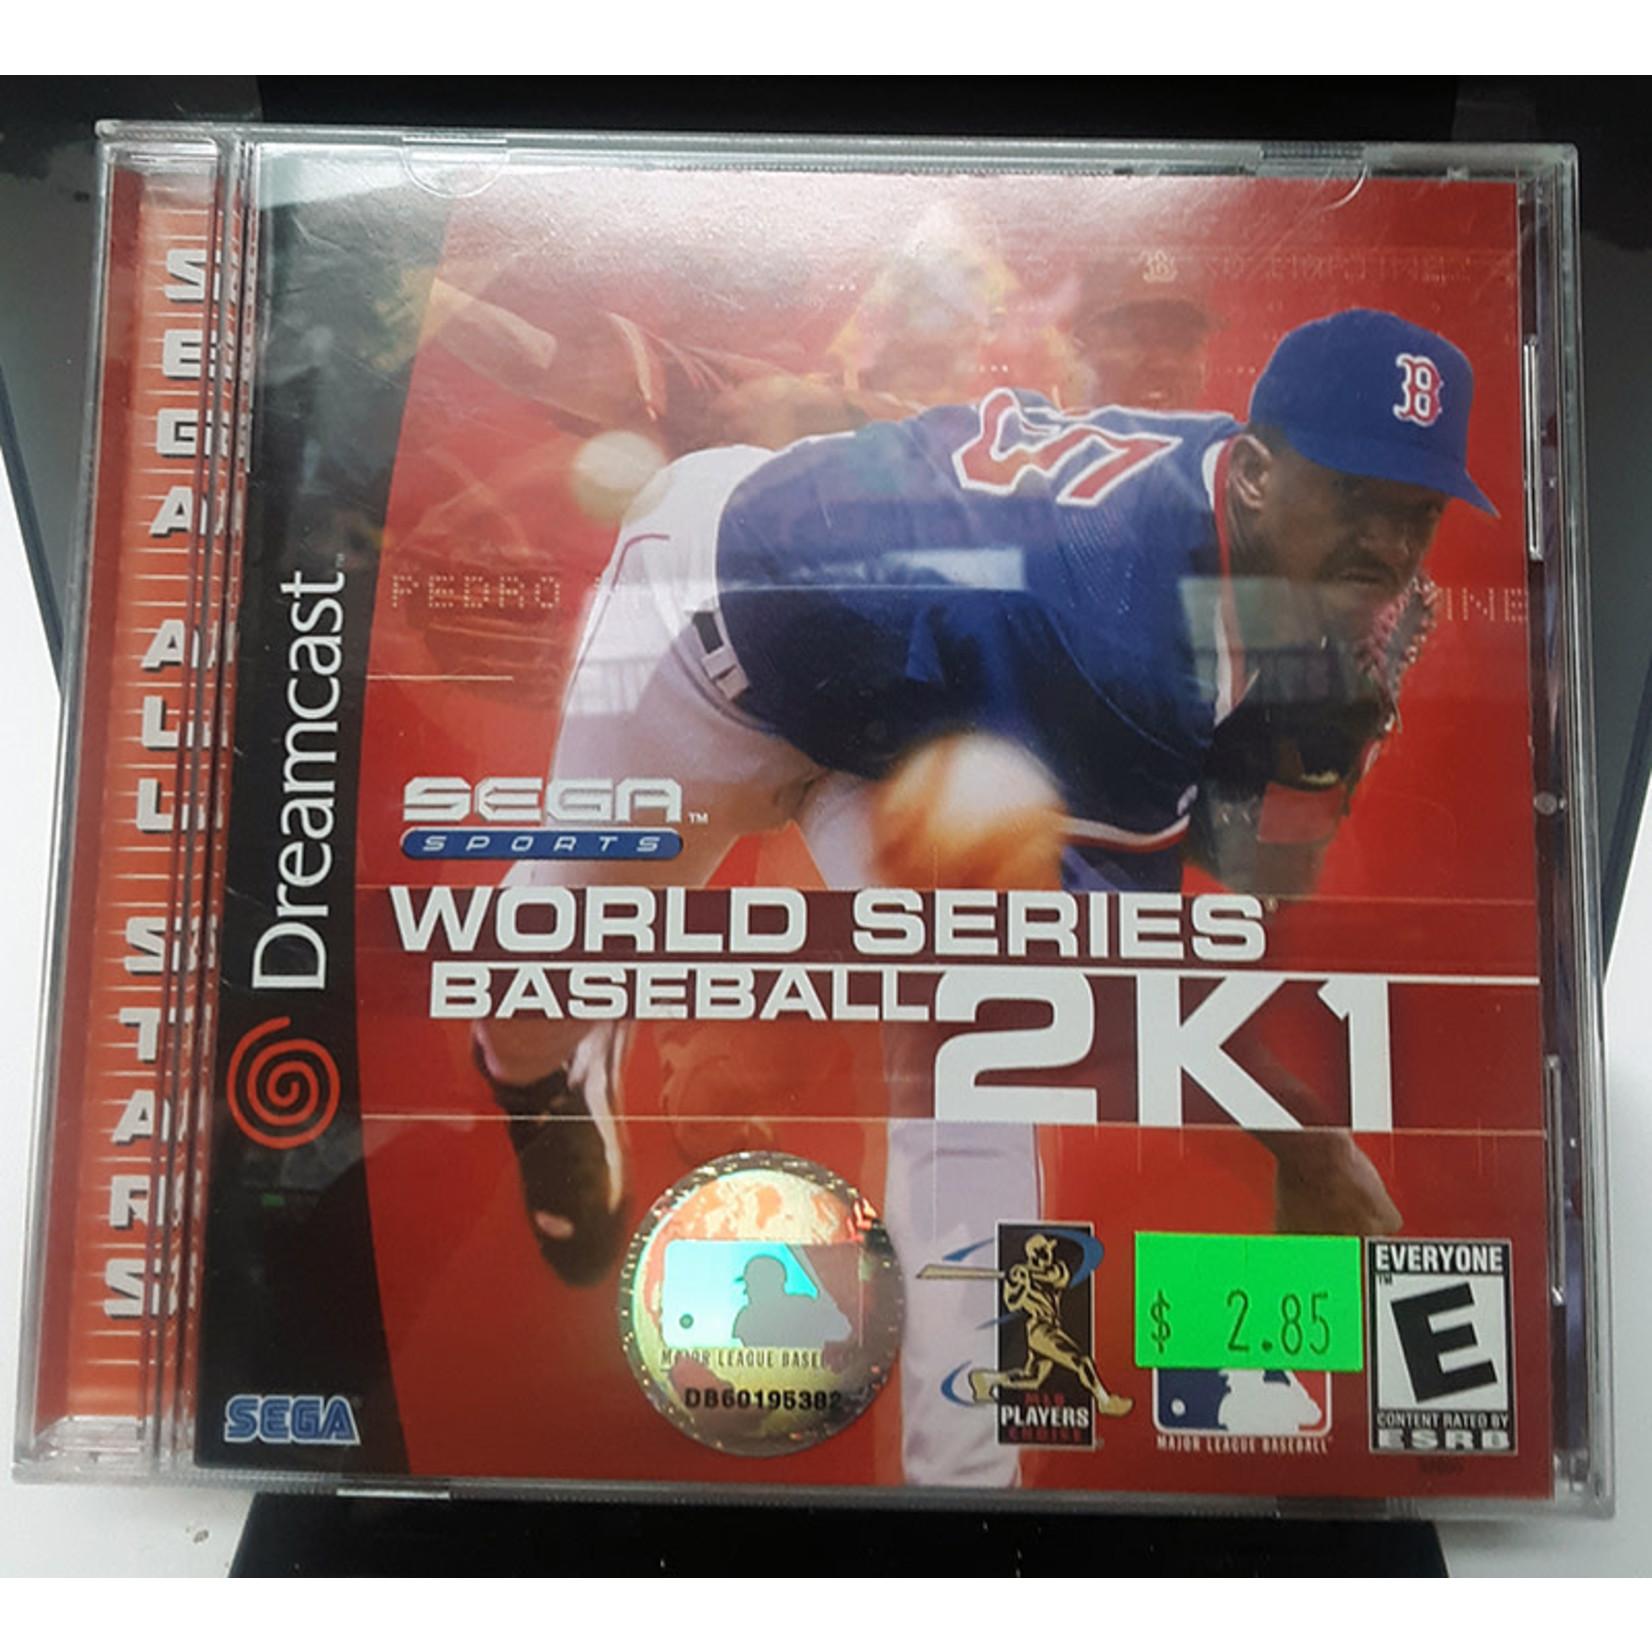 dcu-World Series Baseball 2k1